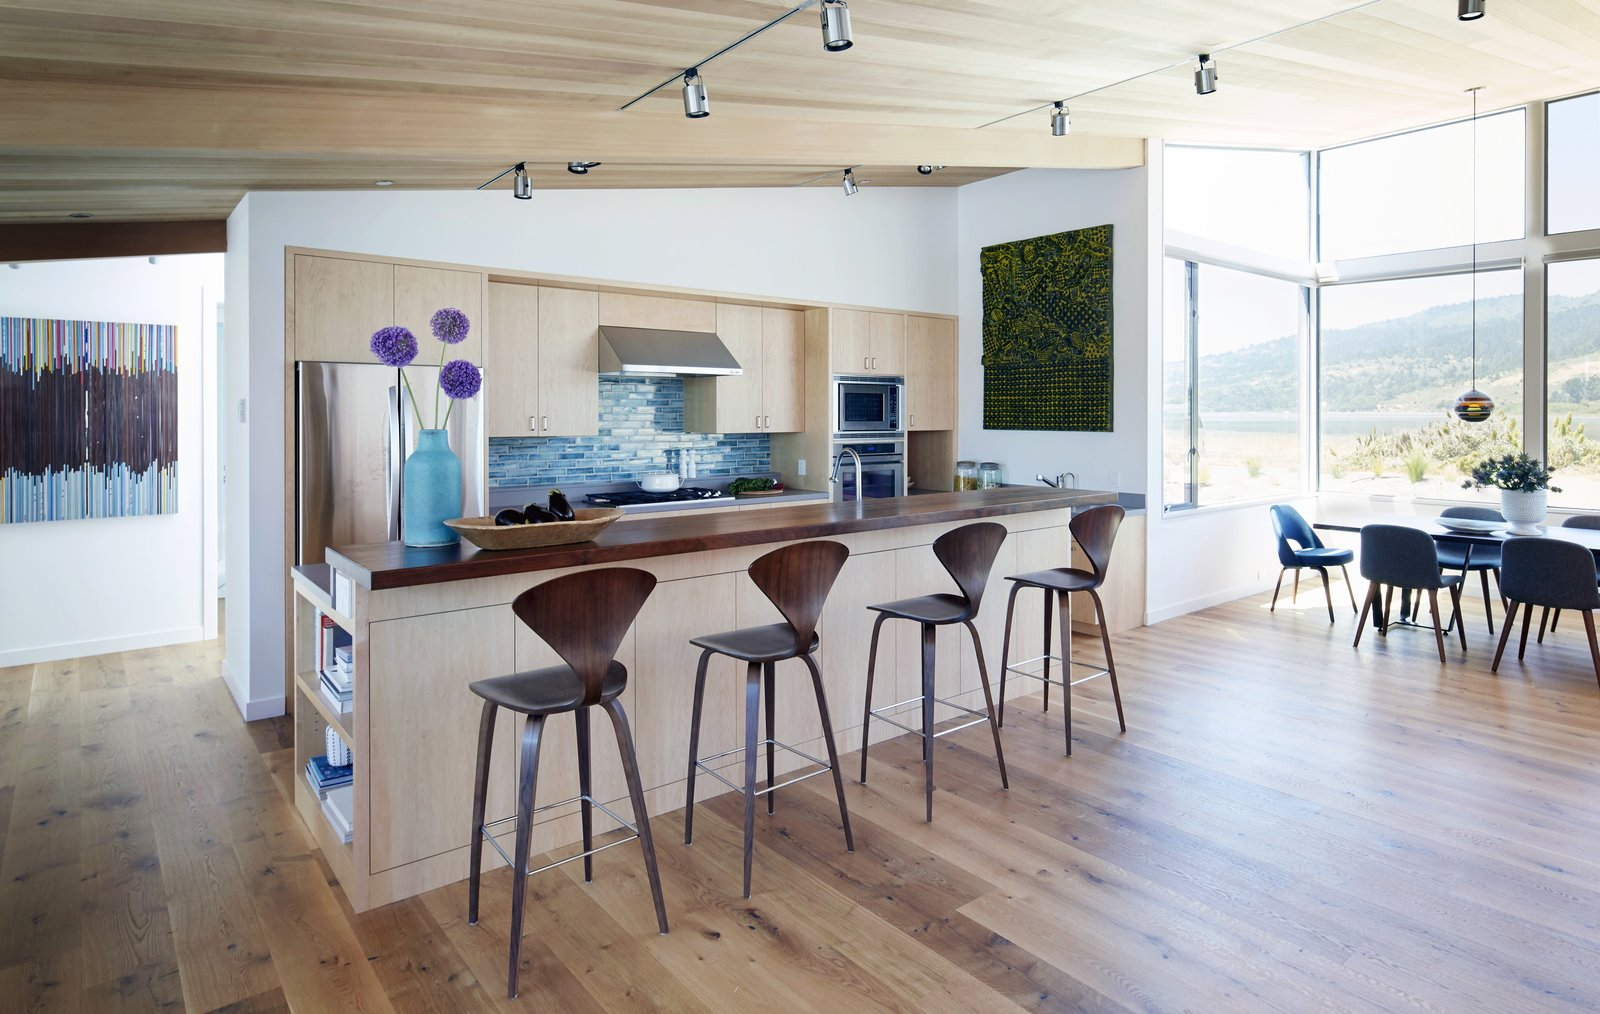 #TurnbullGriffinHaesloop #interior #kitchen #diningroom  Stinson Beach Lagoon Residence by Turnbull Griffin Haesloop Architects